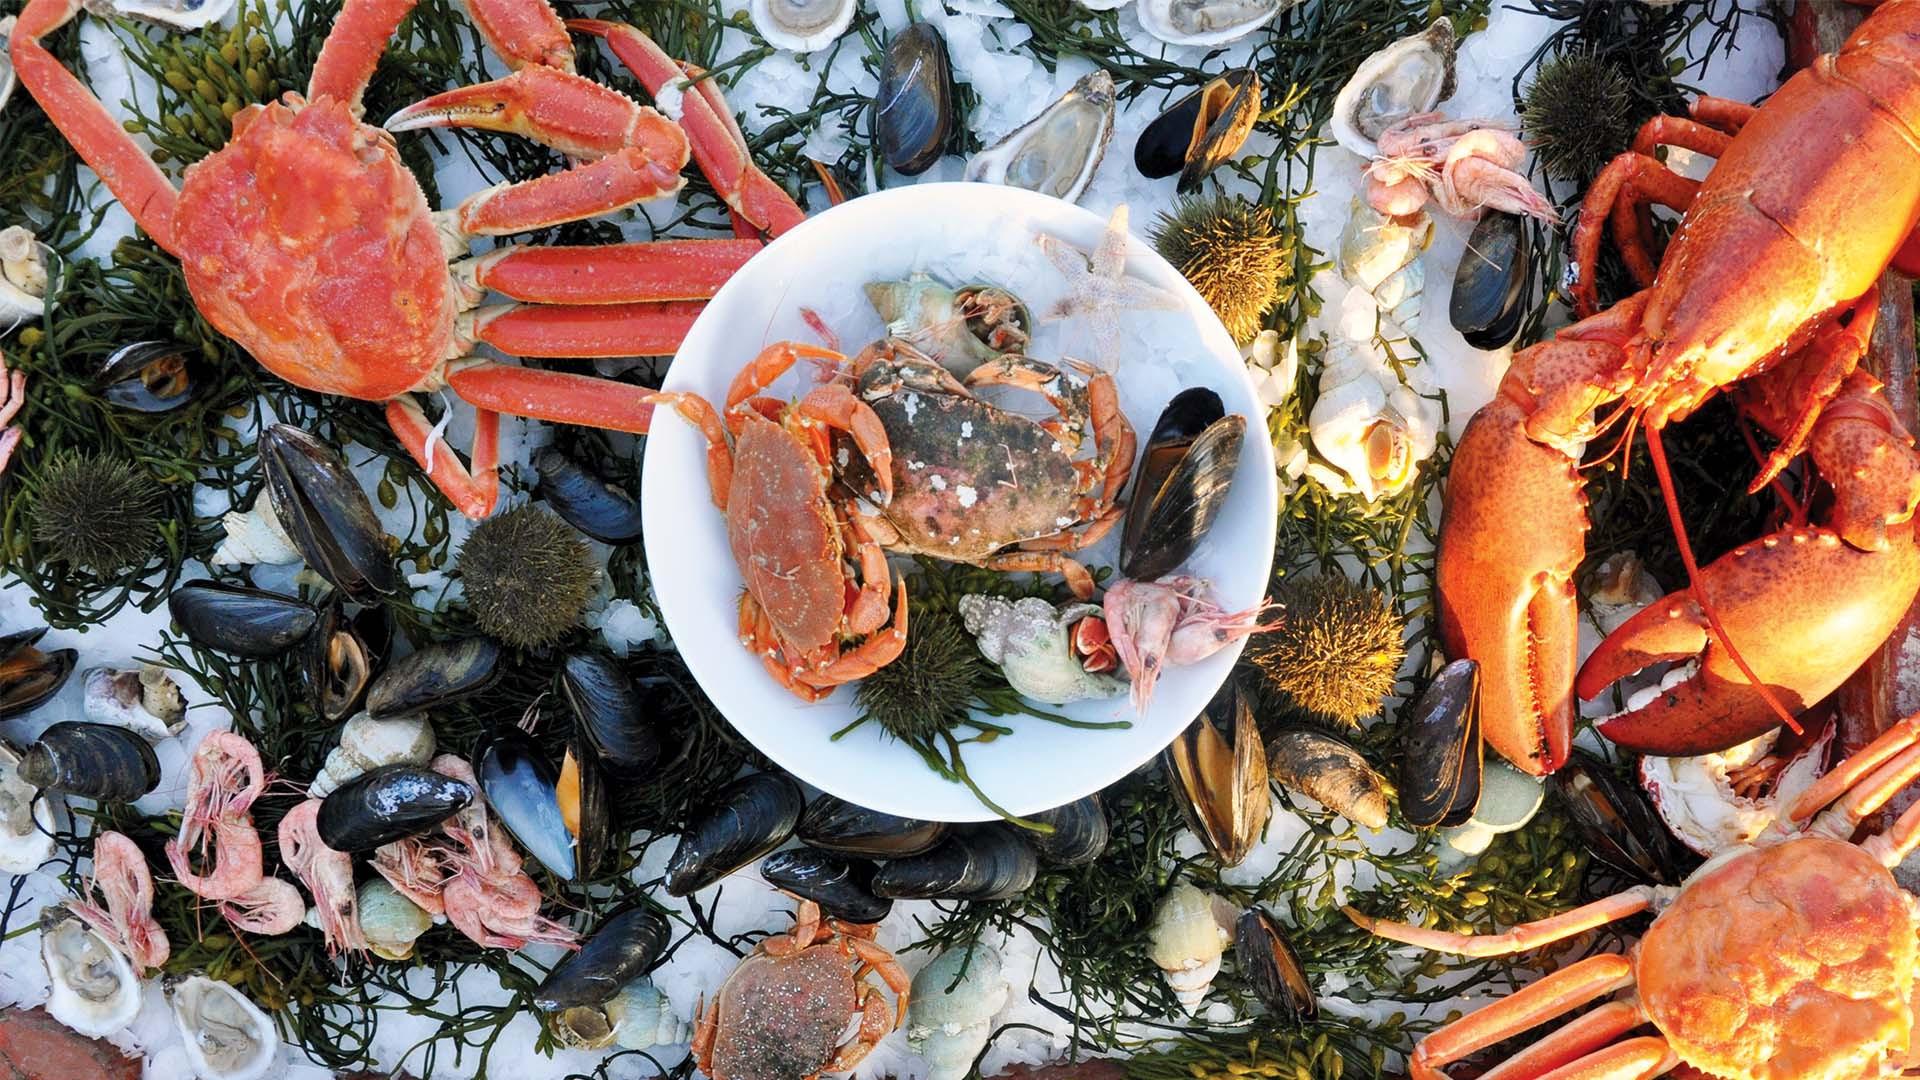 Seafood platter in St. John's Newfoundland & Labrador, Canada